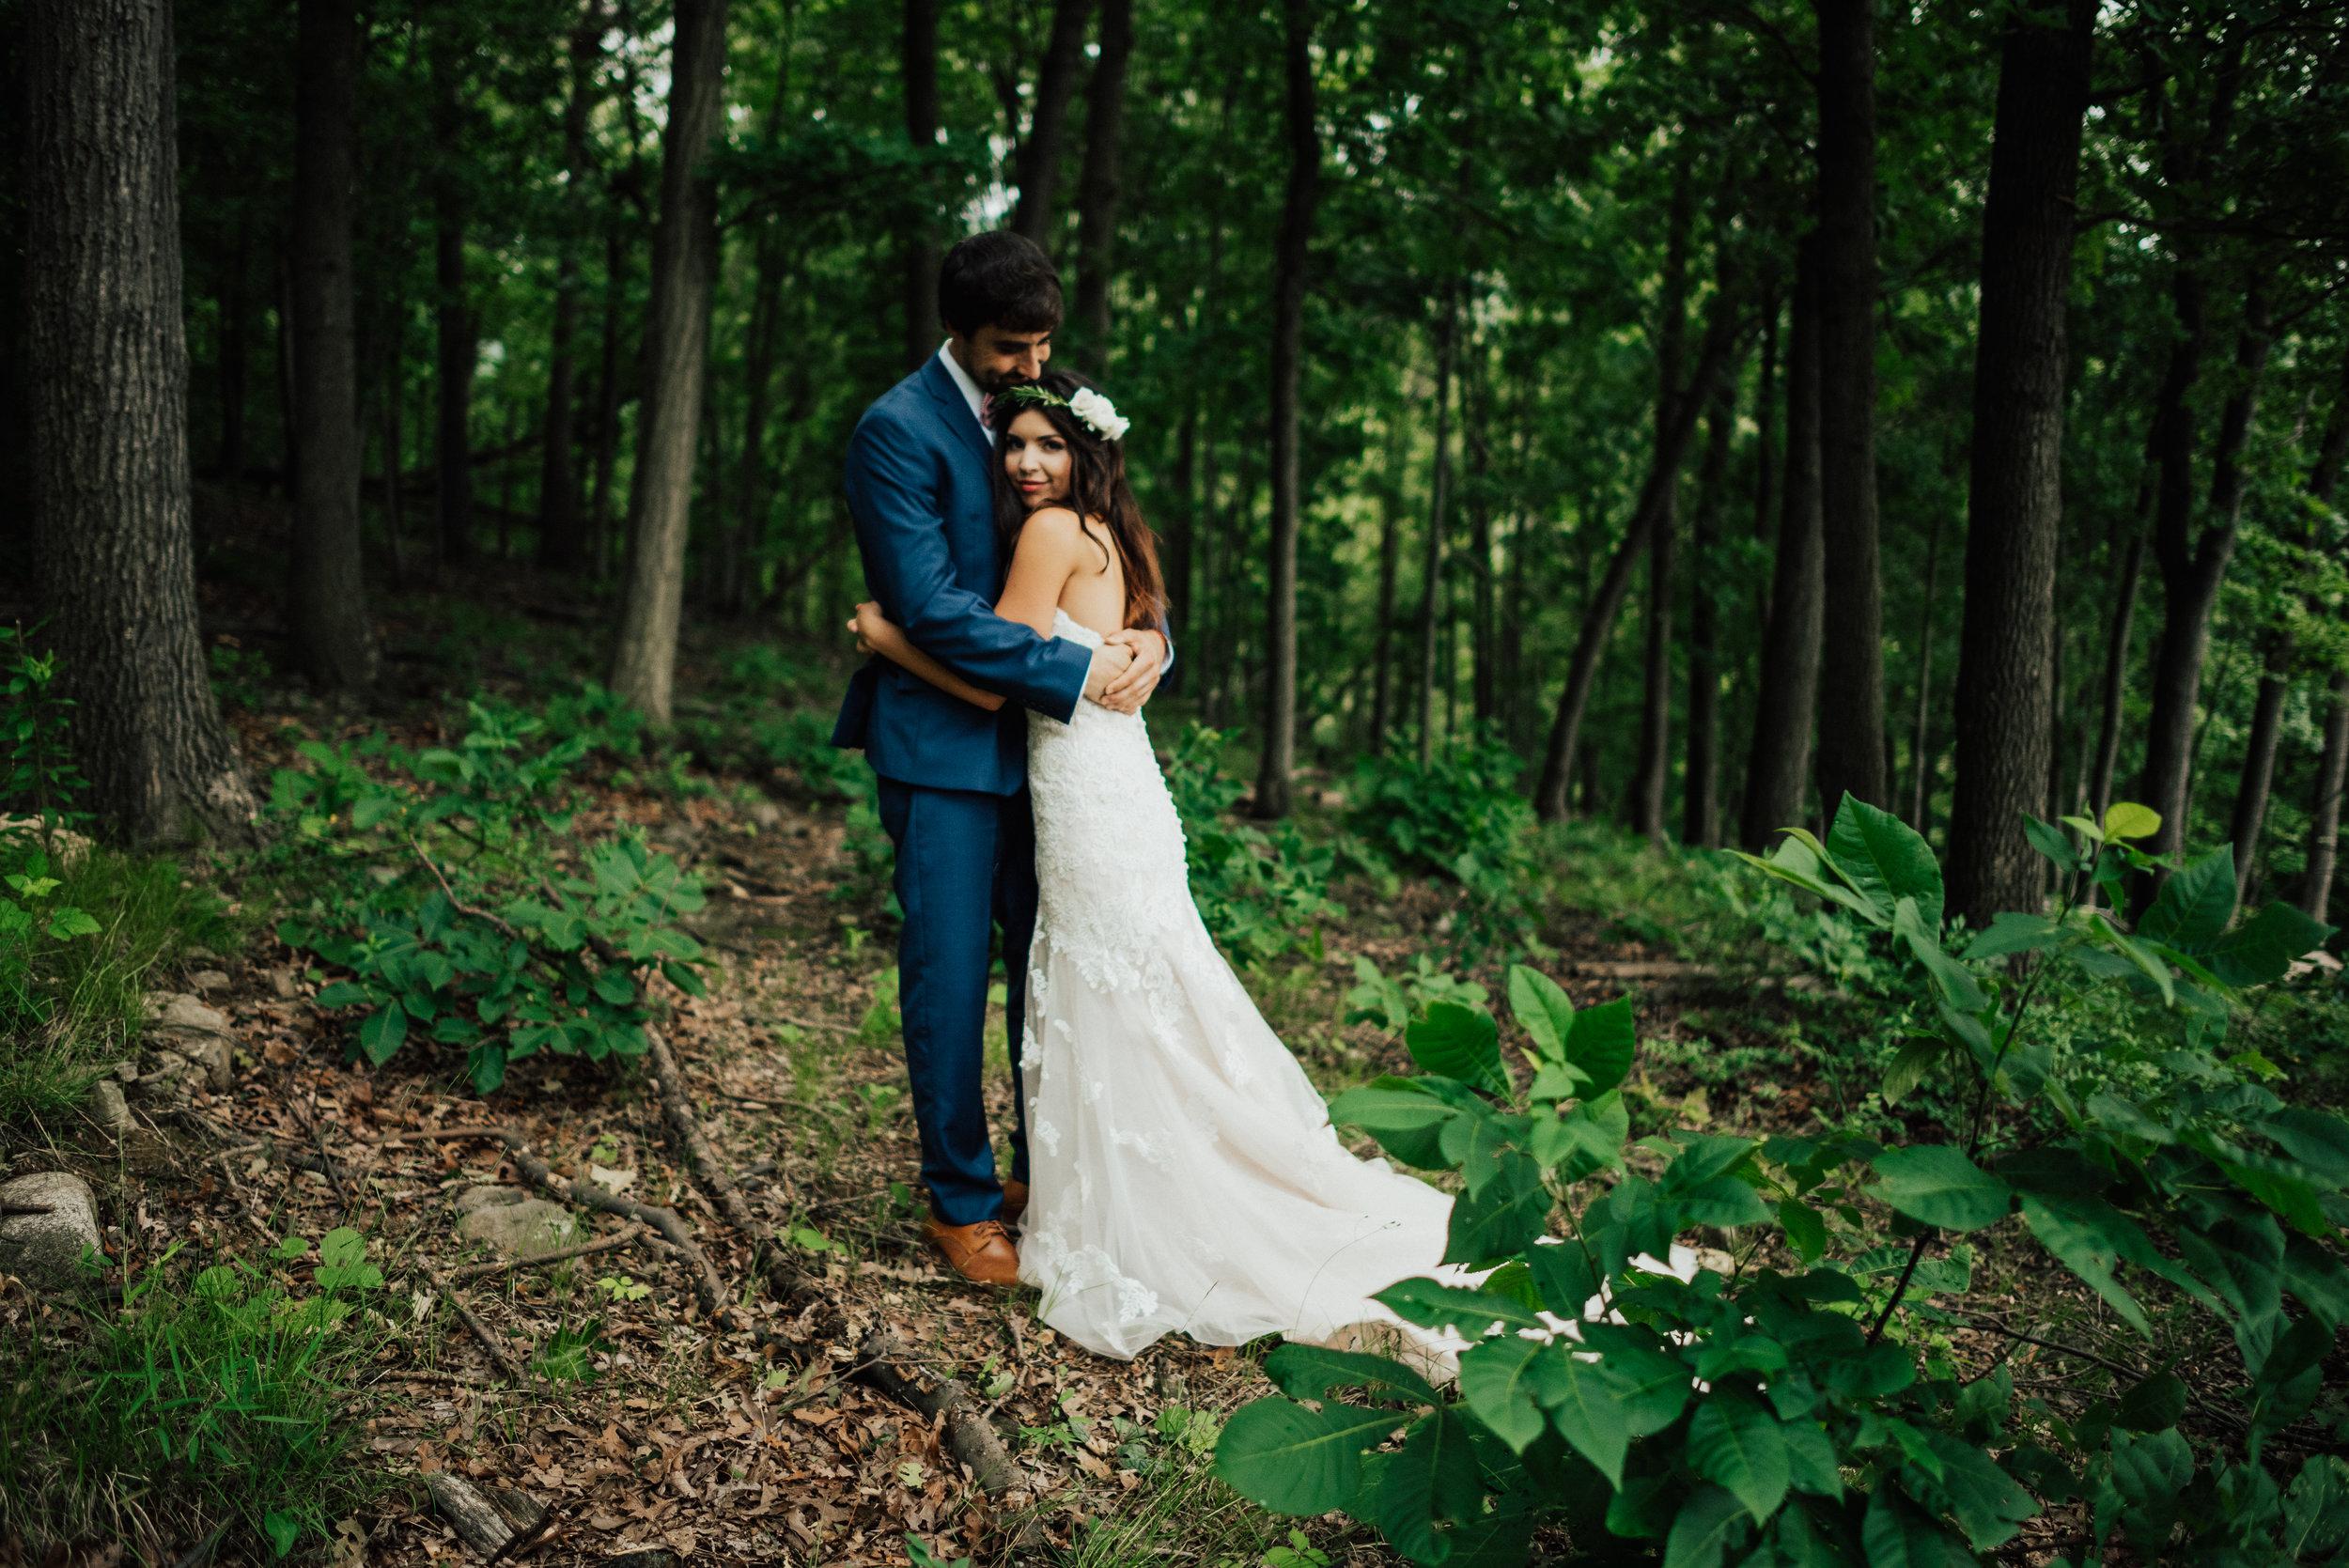 myriah-byron-wedding_pre-ceremony159.jpg